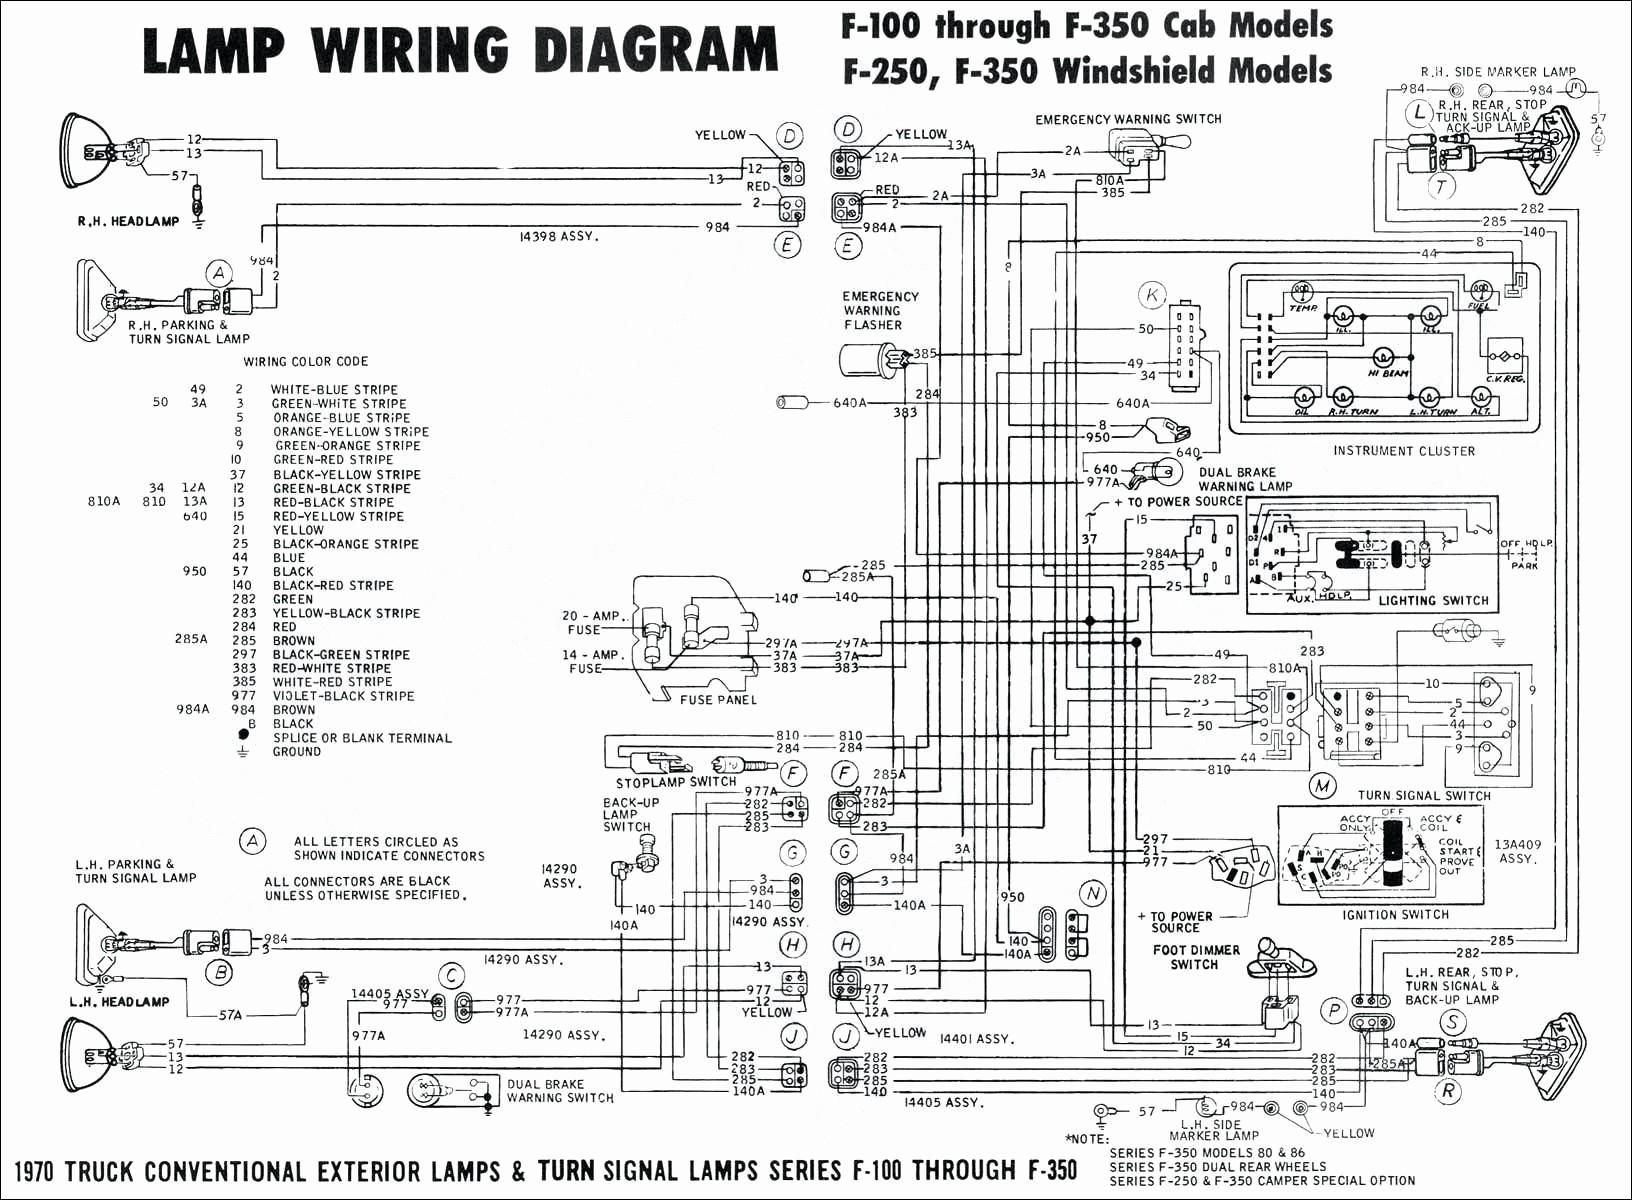 Kib Micro Monitor Manual Monitor Panel K21 Wiring Diagram Of Kib Micro Monitor Manual